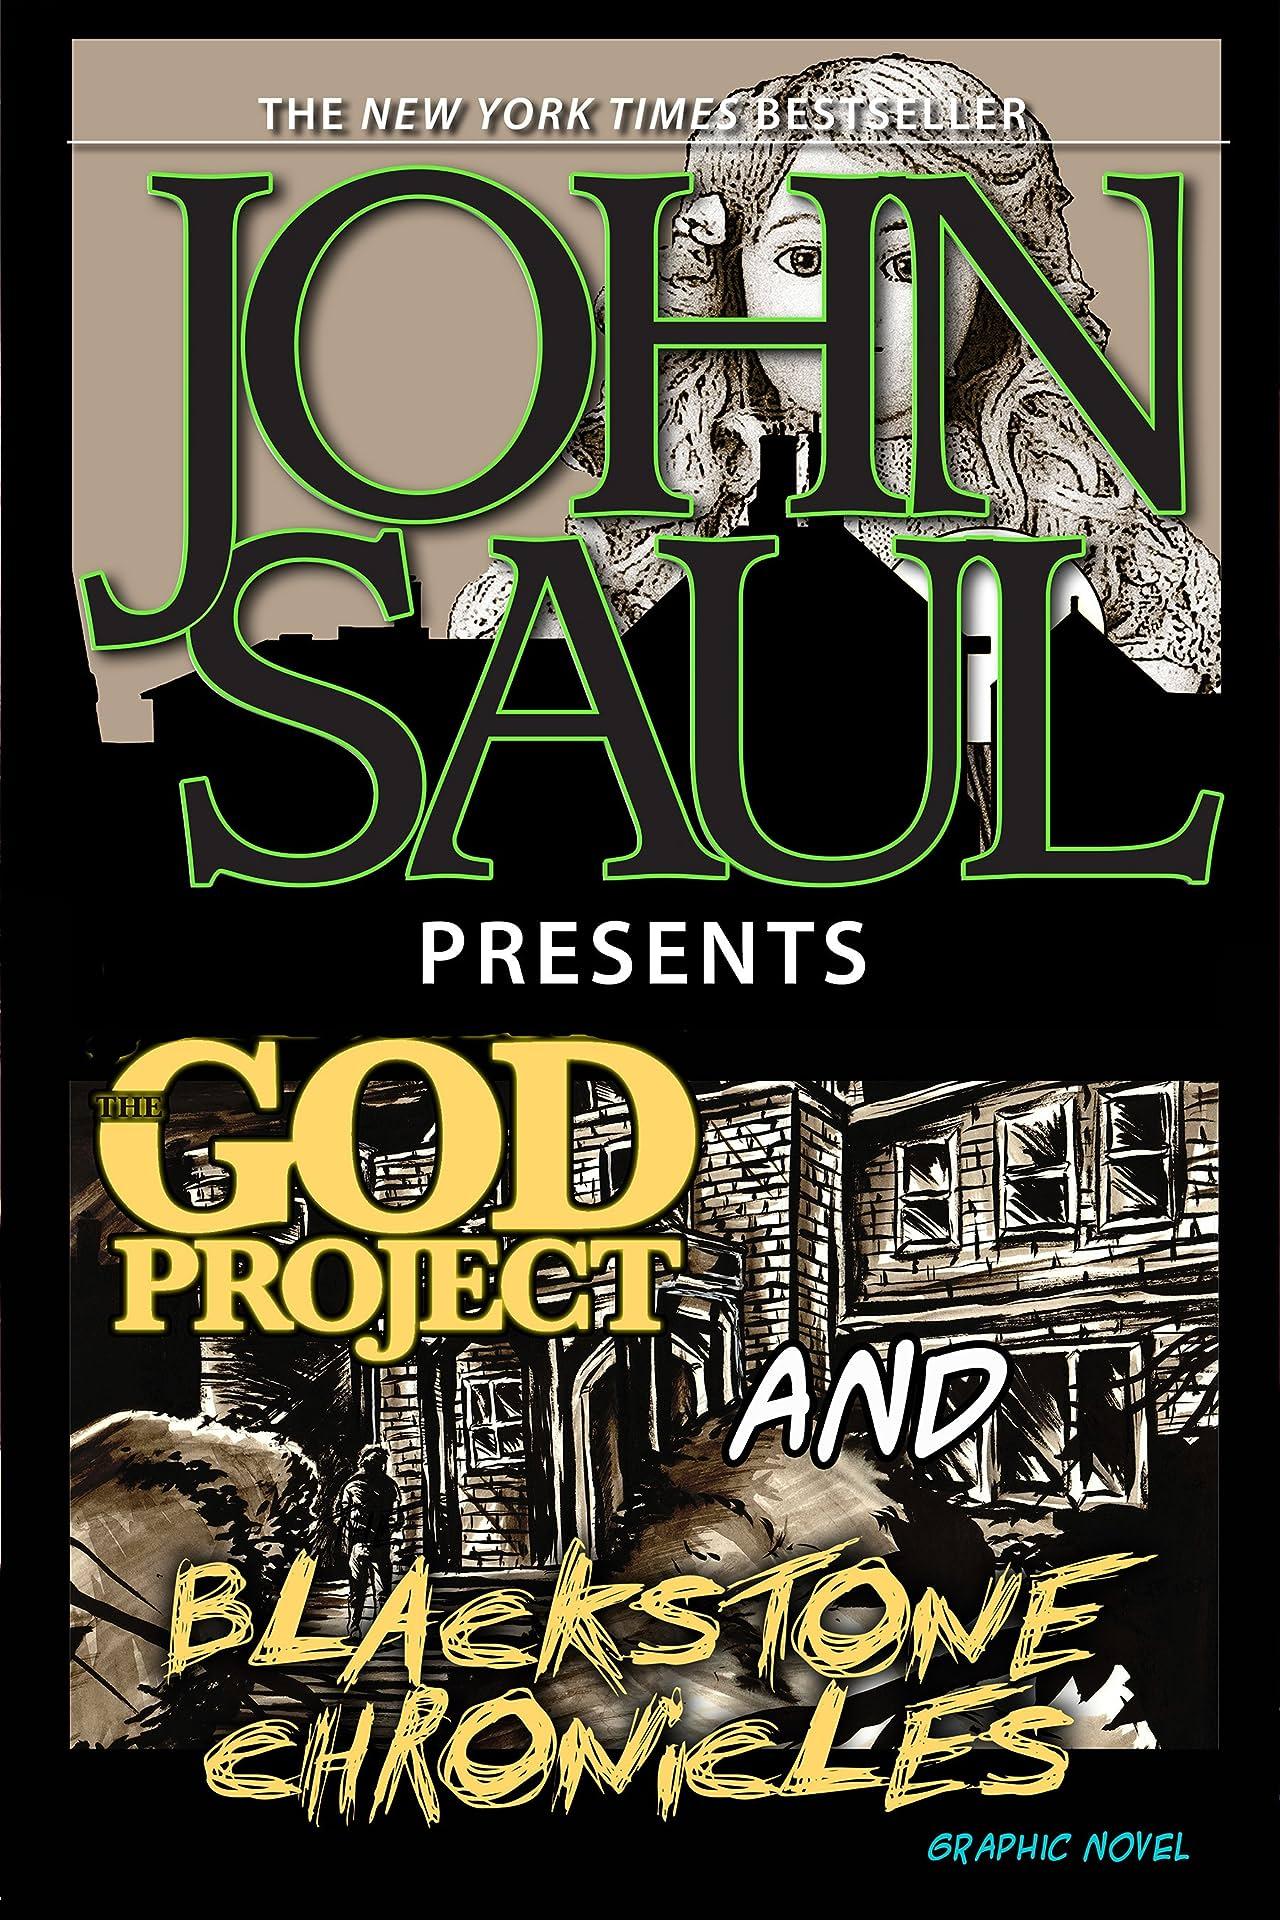 John Saul Presents: Omnibus